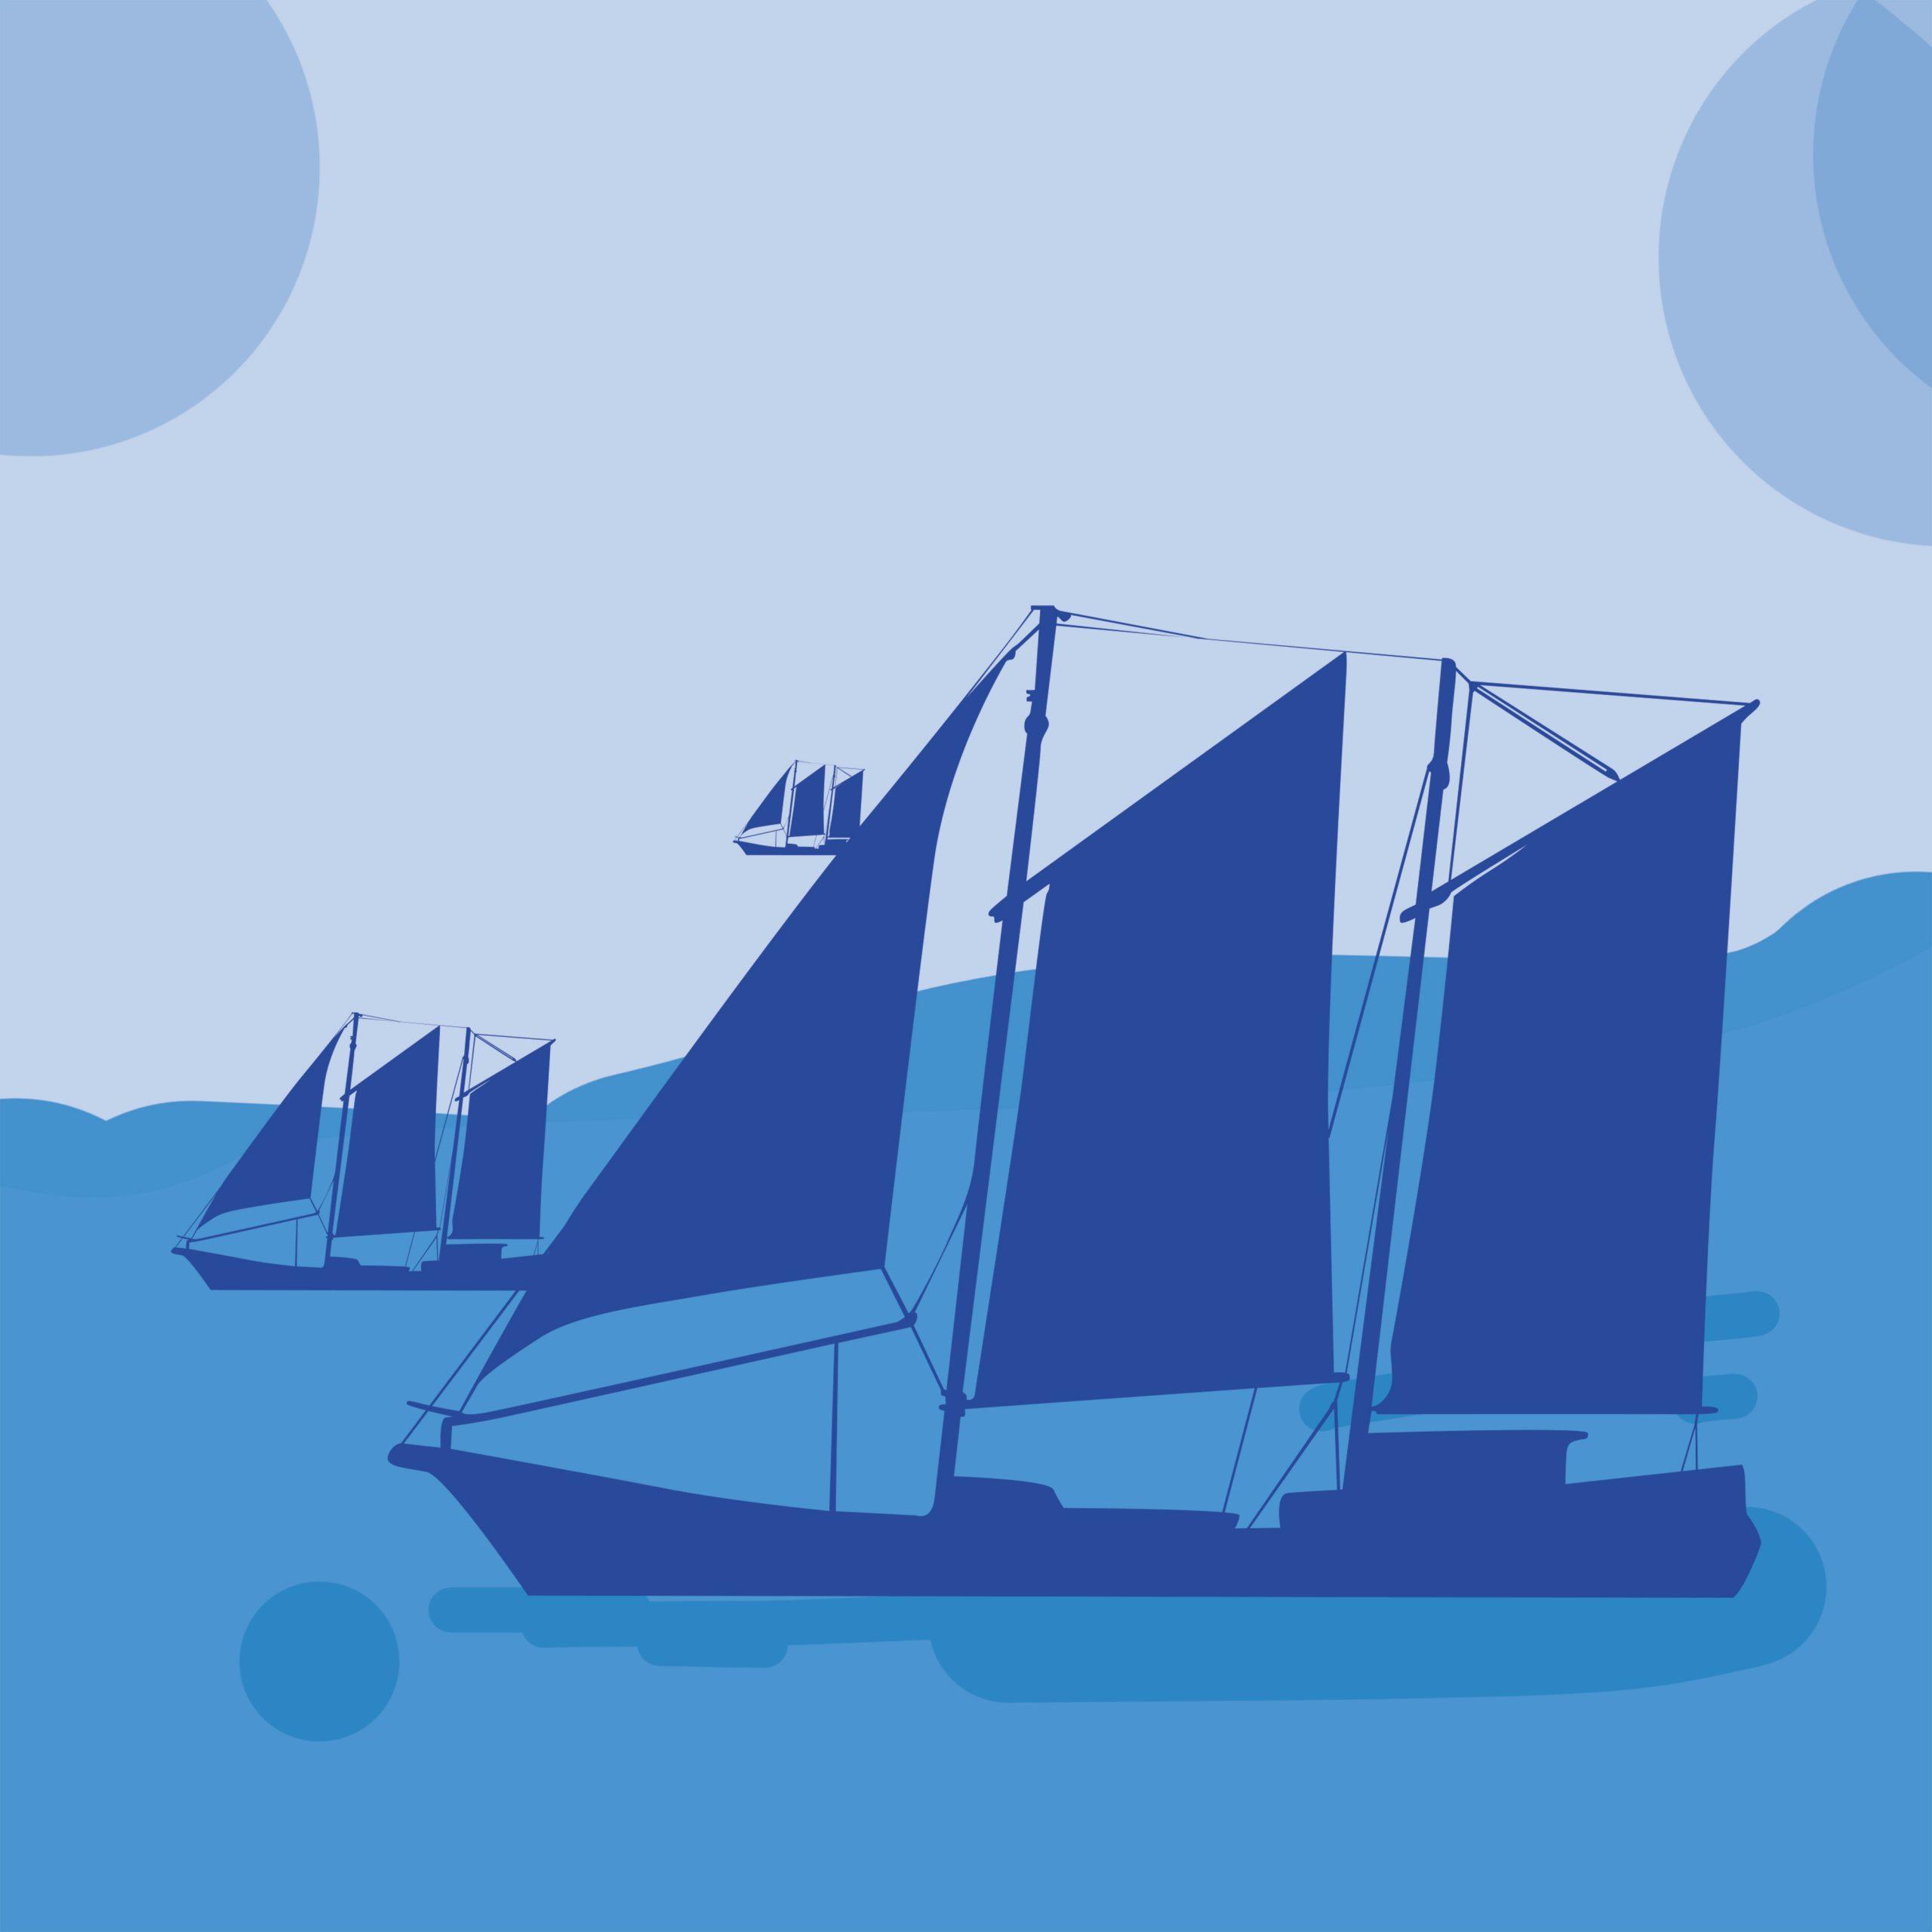 Ship and sea illustration